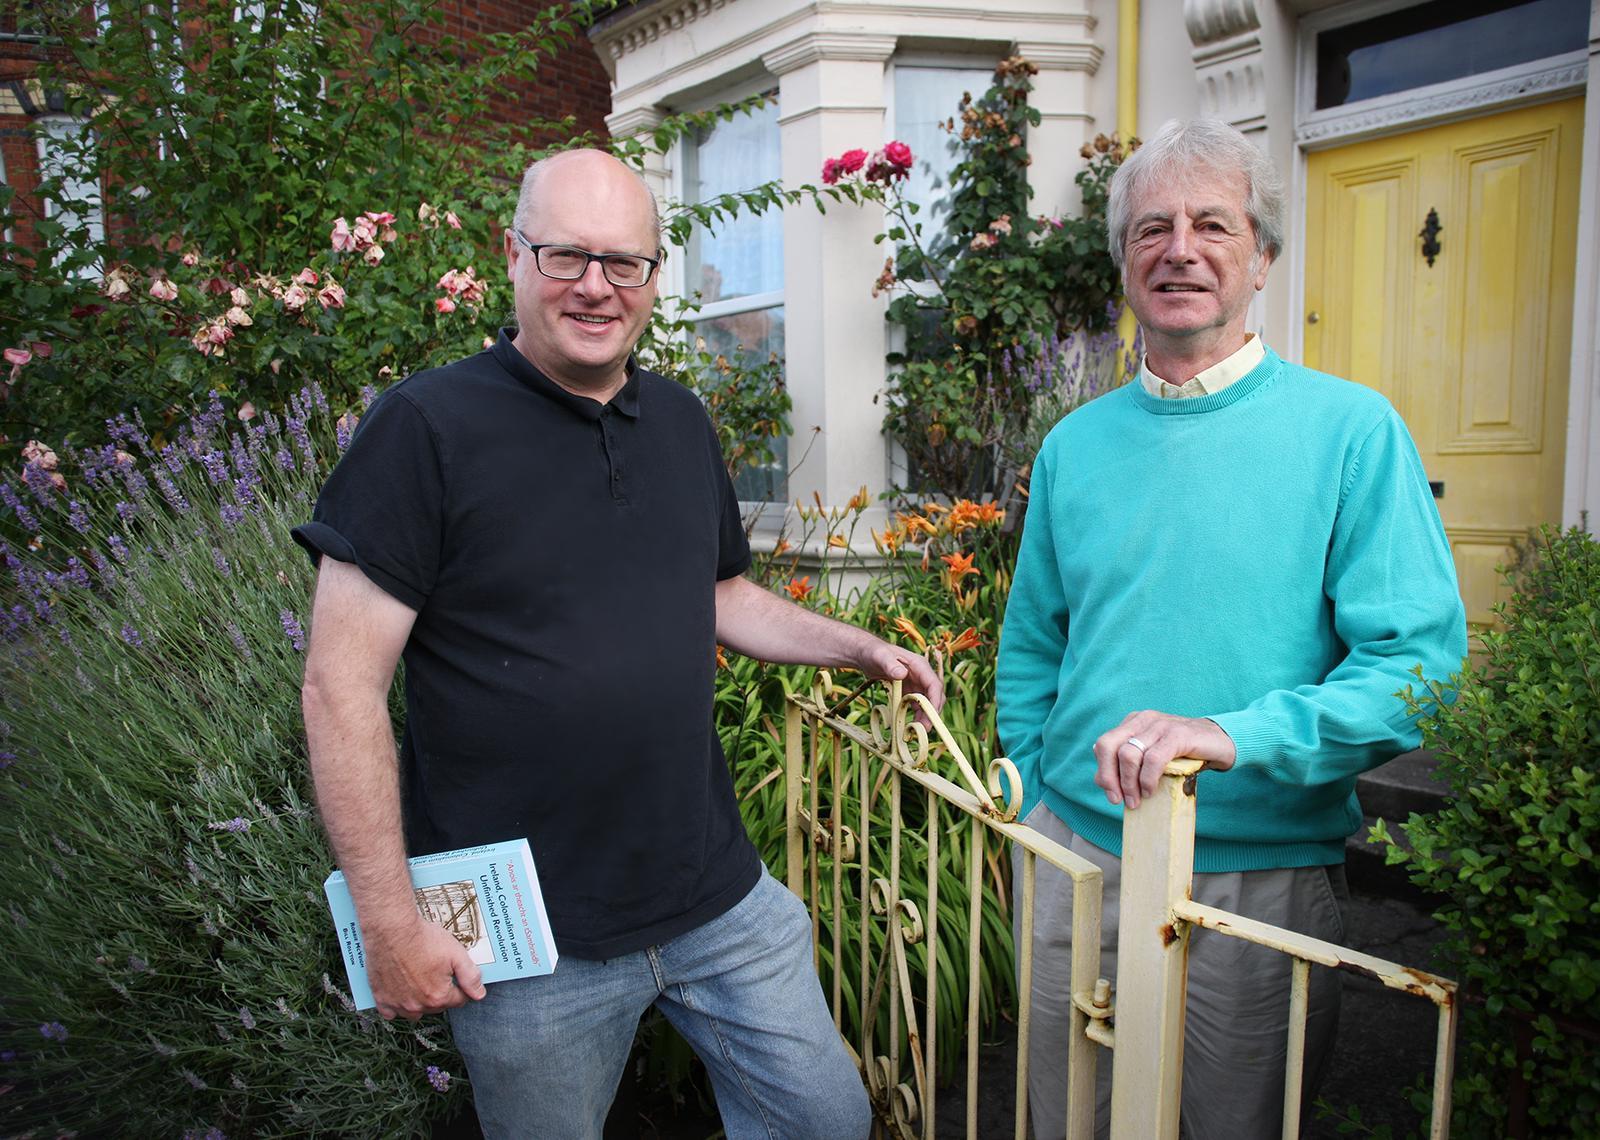 SNUG D FAN: Robbie McVeigh (left) with fellow-author Bill Rolston.